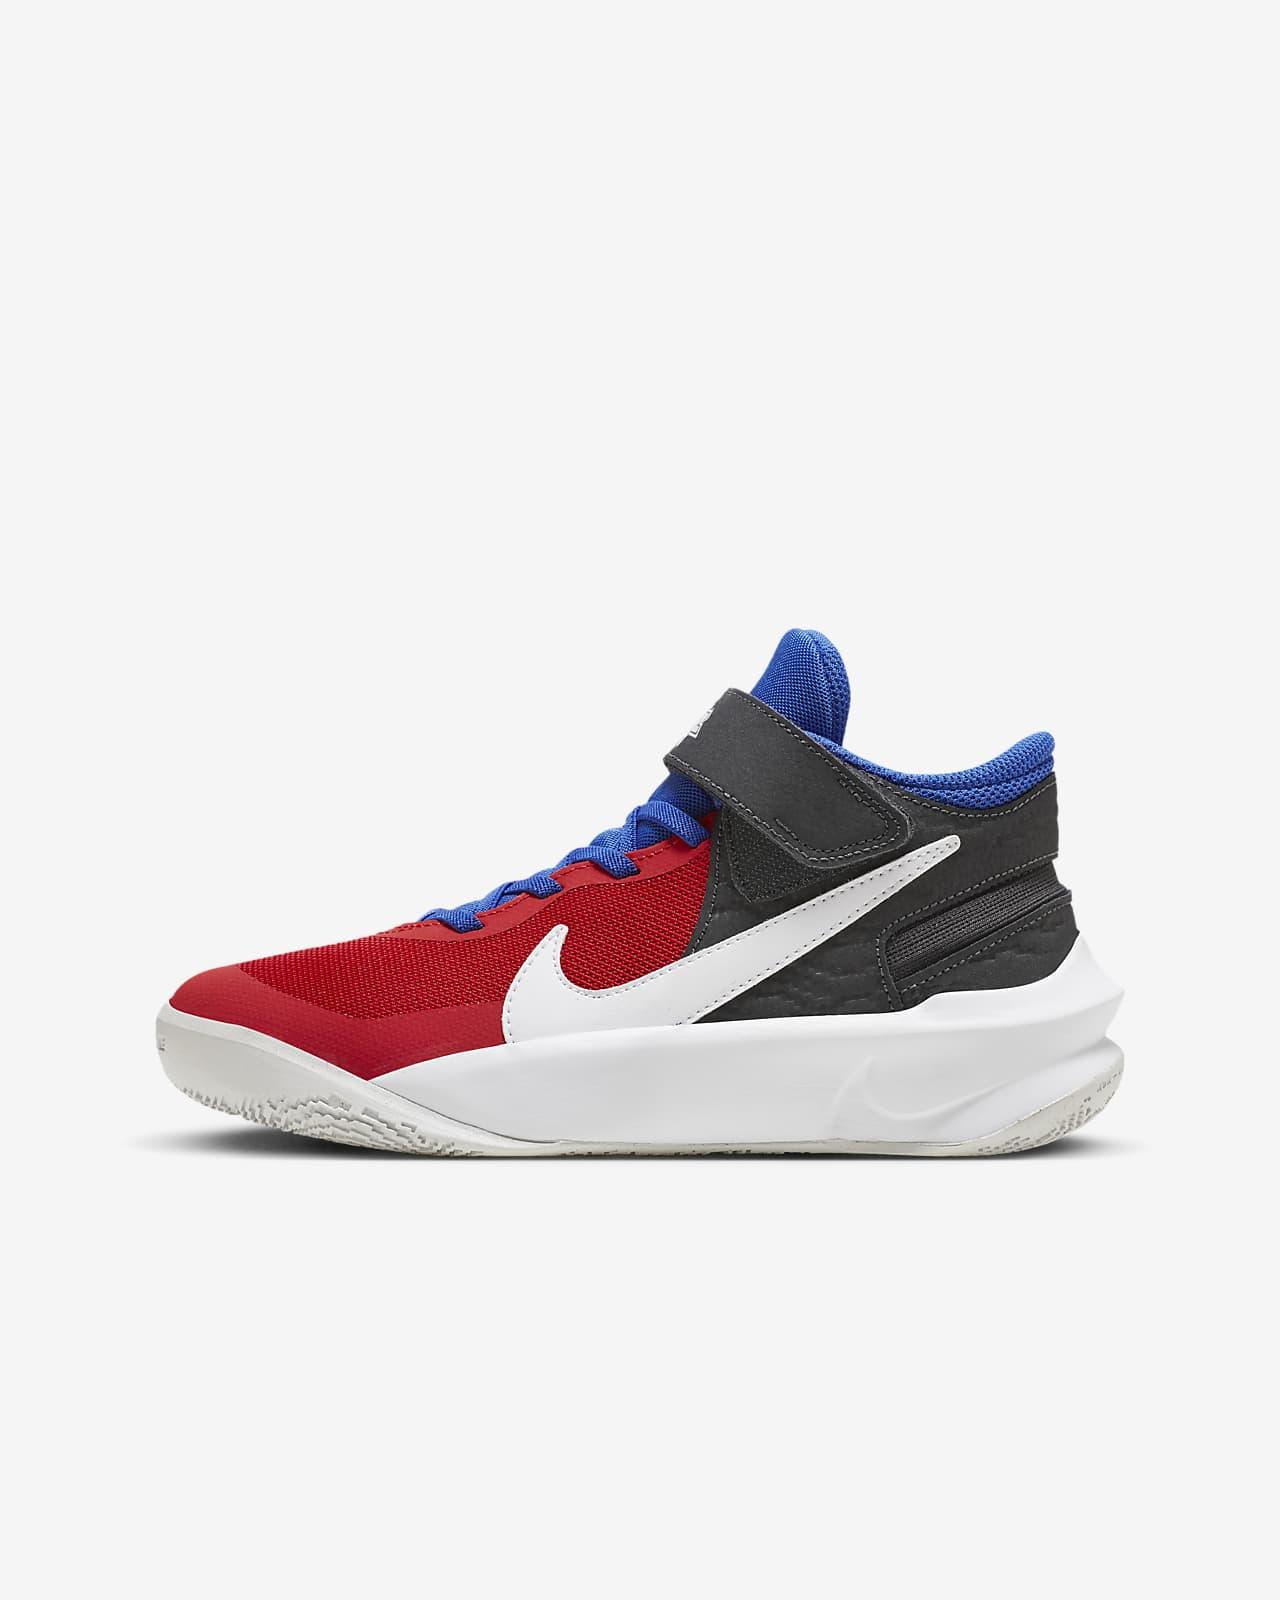 Nike Team Hustle D 10 FlyEase Big Kids' Basketball Shoe